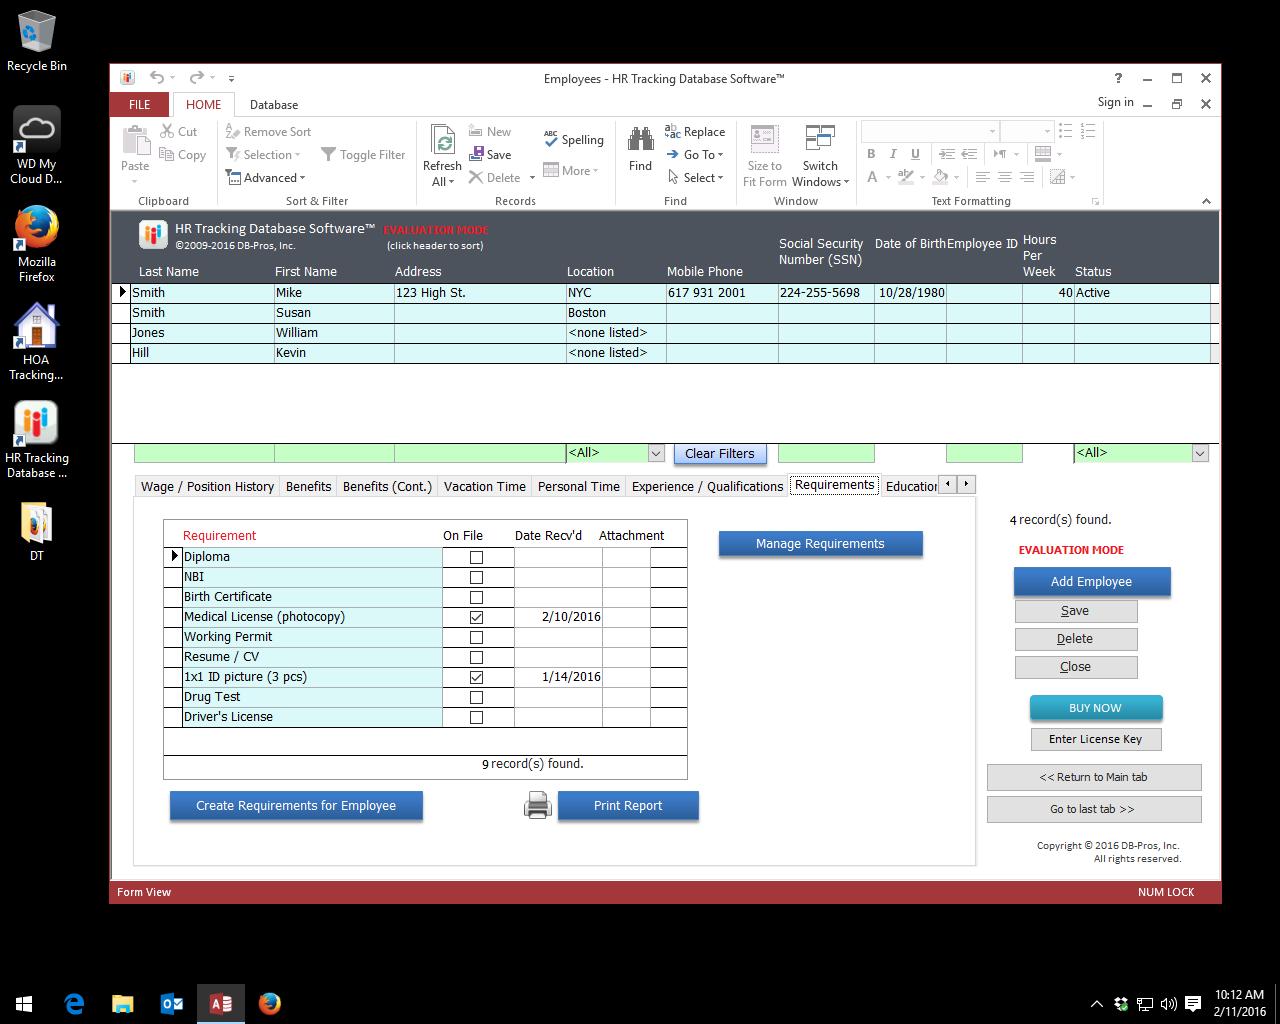 HR Tracking Database Software Screenshot